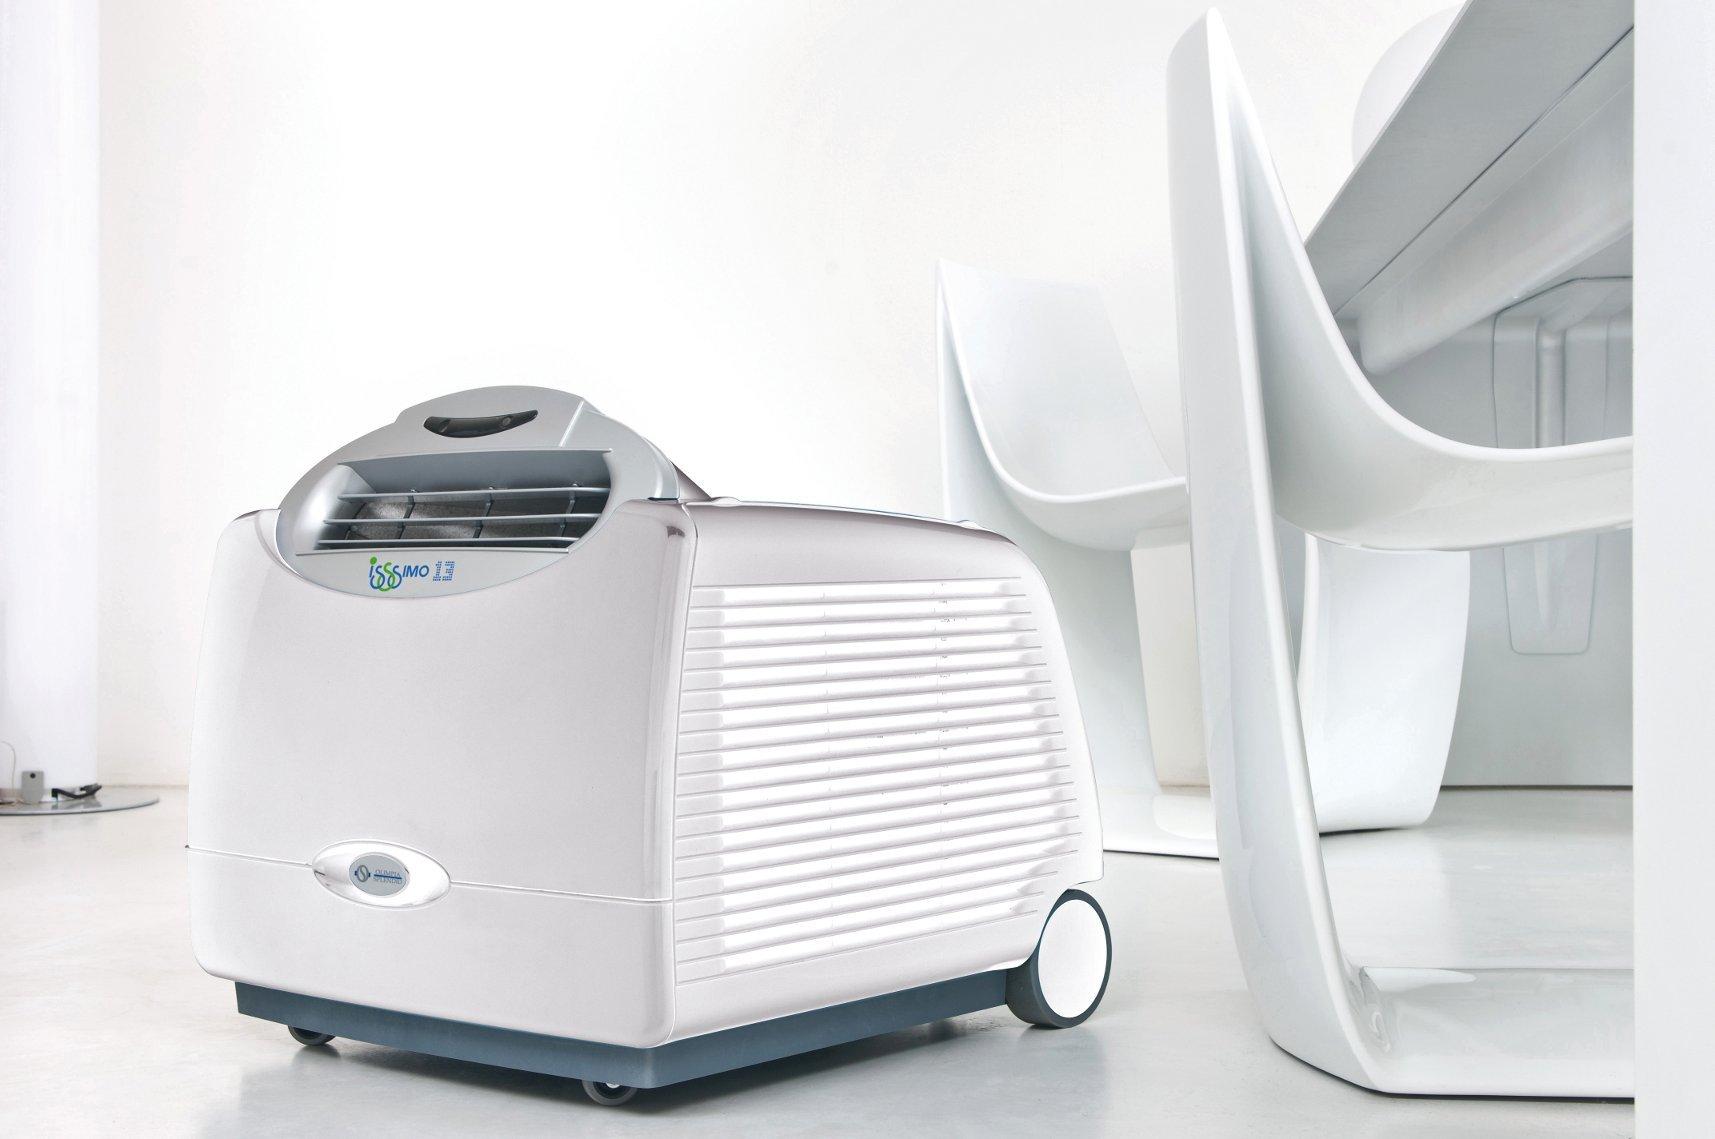 mitsubishi klimaanlage fernbedienung anleitung. Black Bedroom Furniture Sets. Home Design Ideas